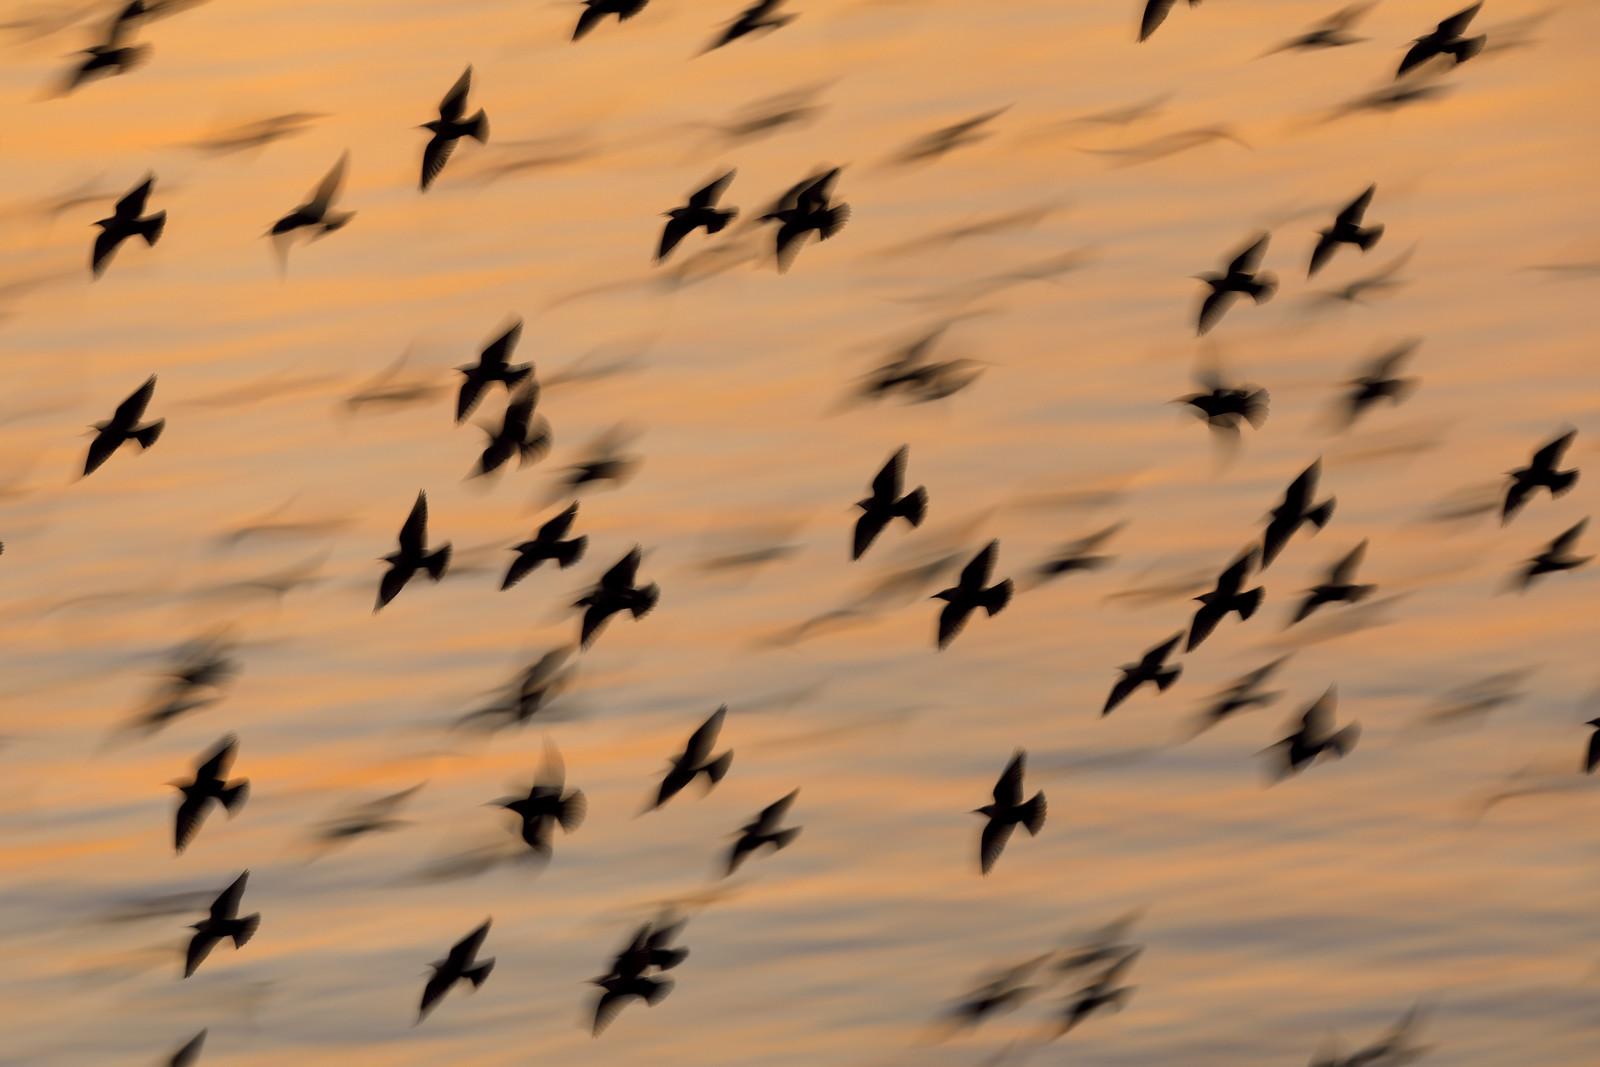 Starling Blurmuration and sea